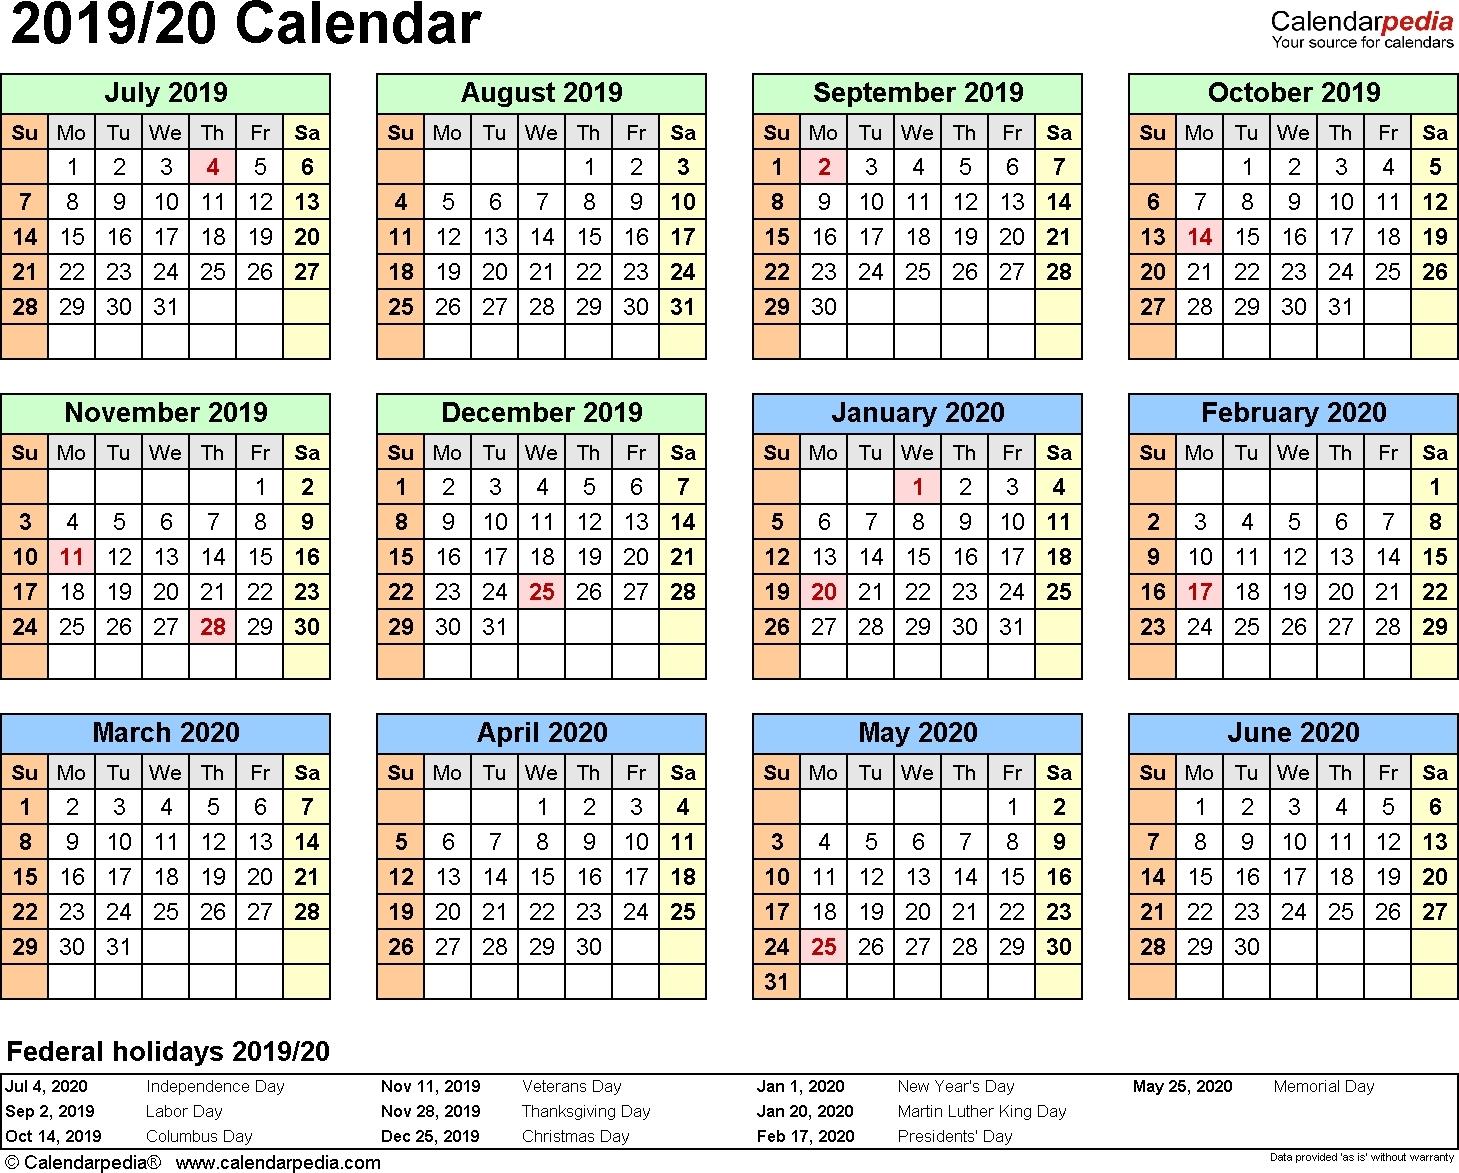 Upanayan Dates In 2020-2021 - Google Search-January 2020 Calendar Drik Panchang